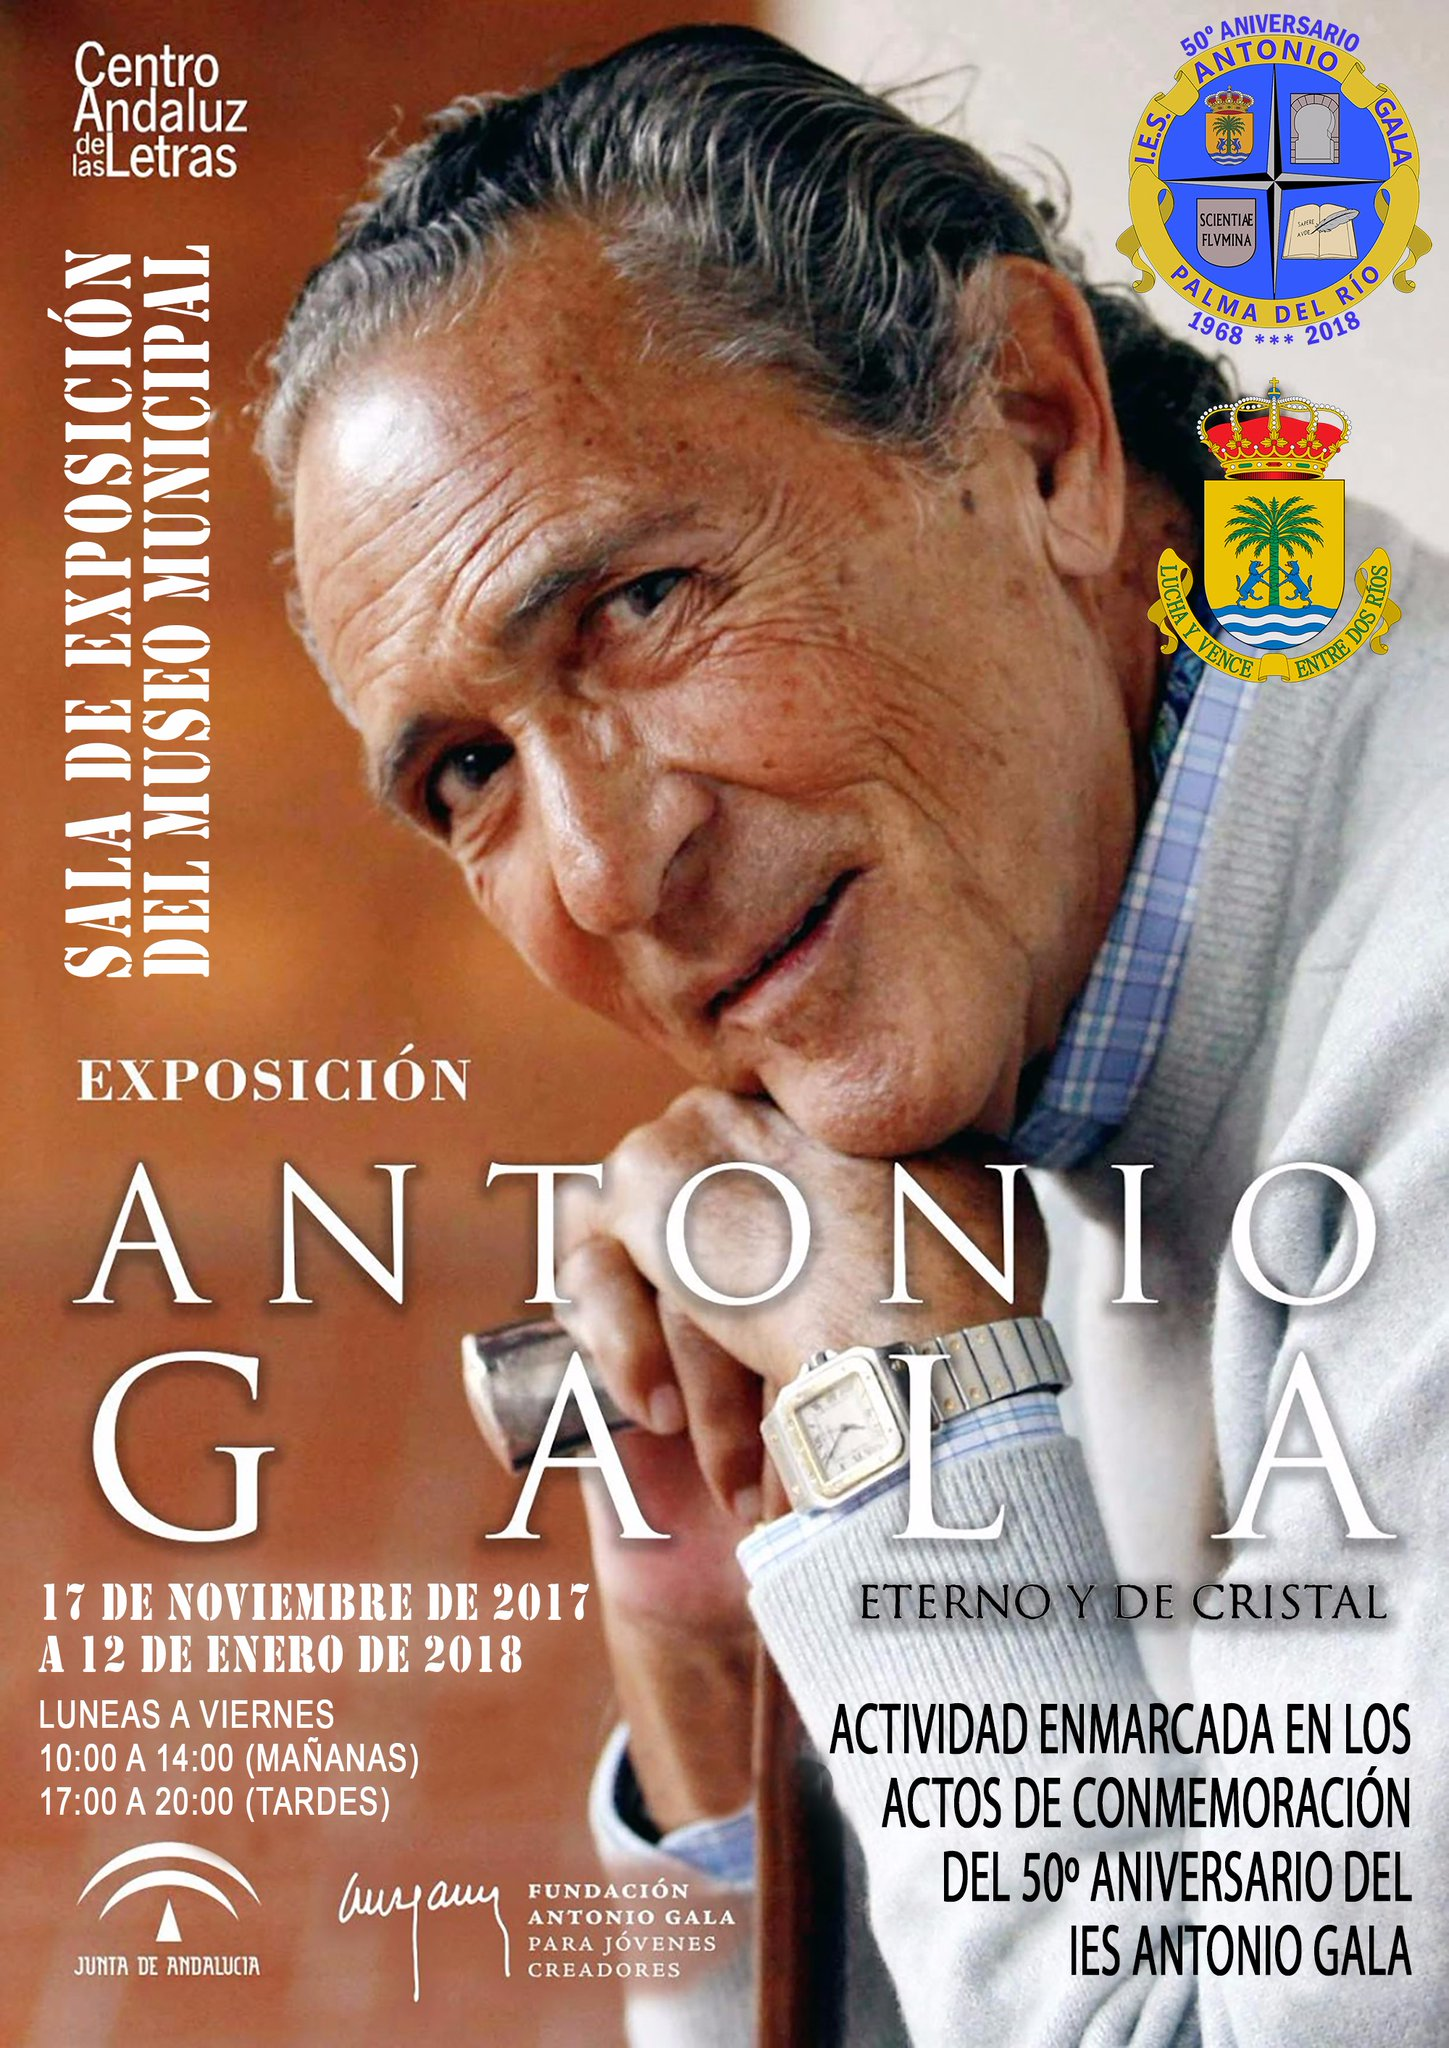 https://www.palmadelrio.es/sites/default/files/antonio_gala_1.jpeg